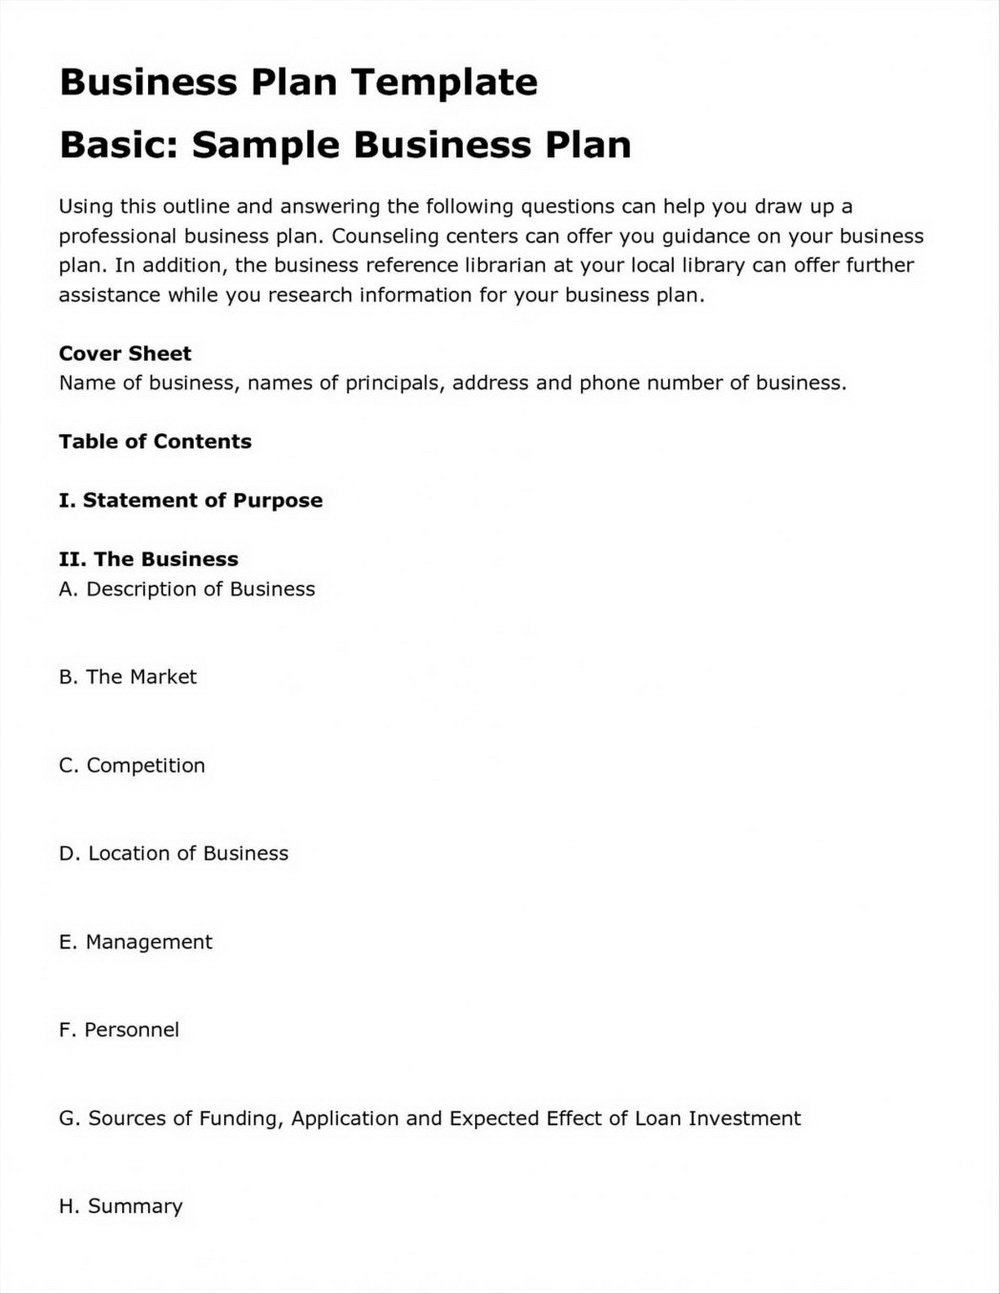 Business Plan Template Sba.gov